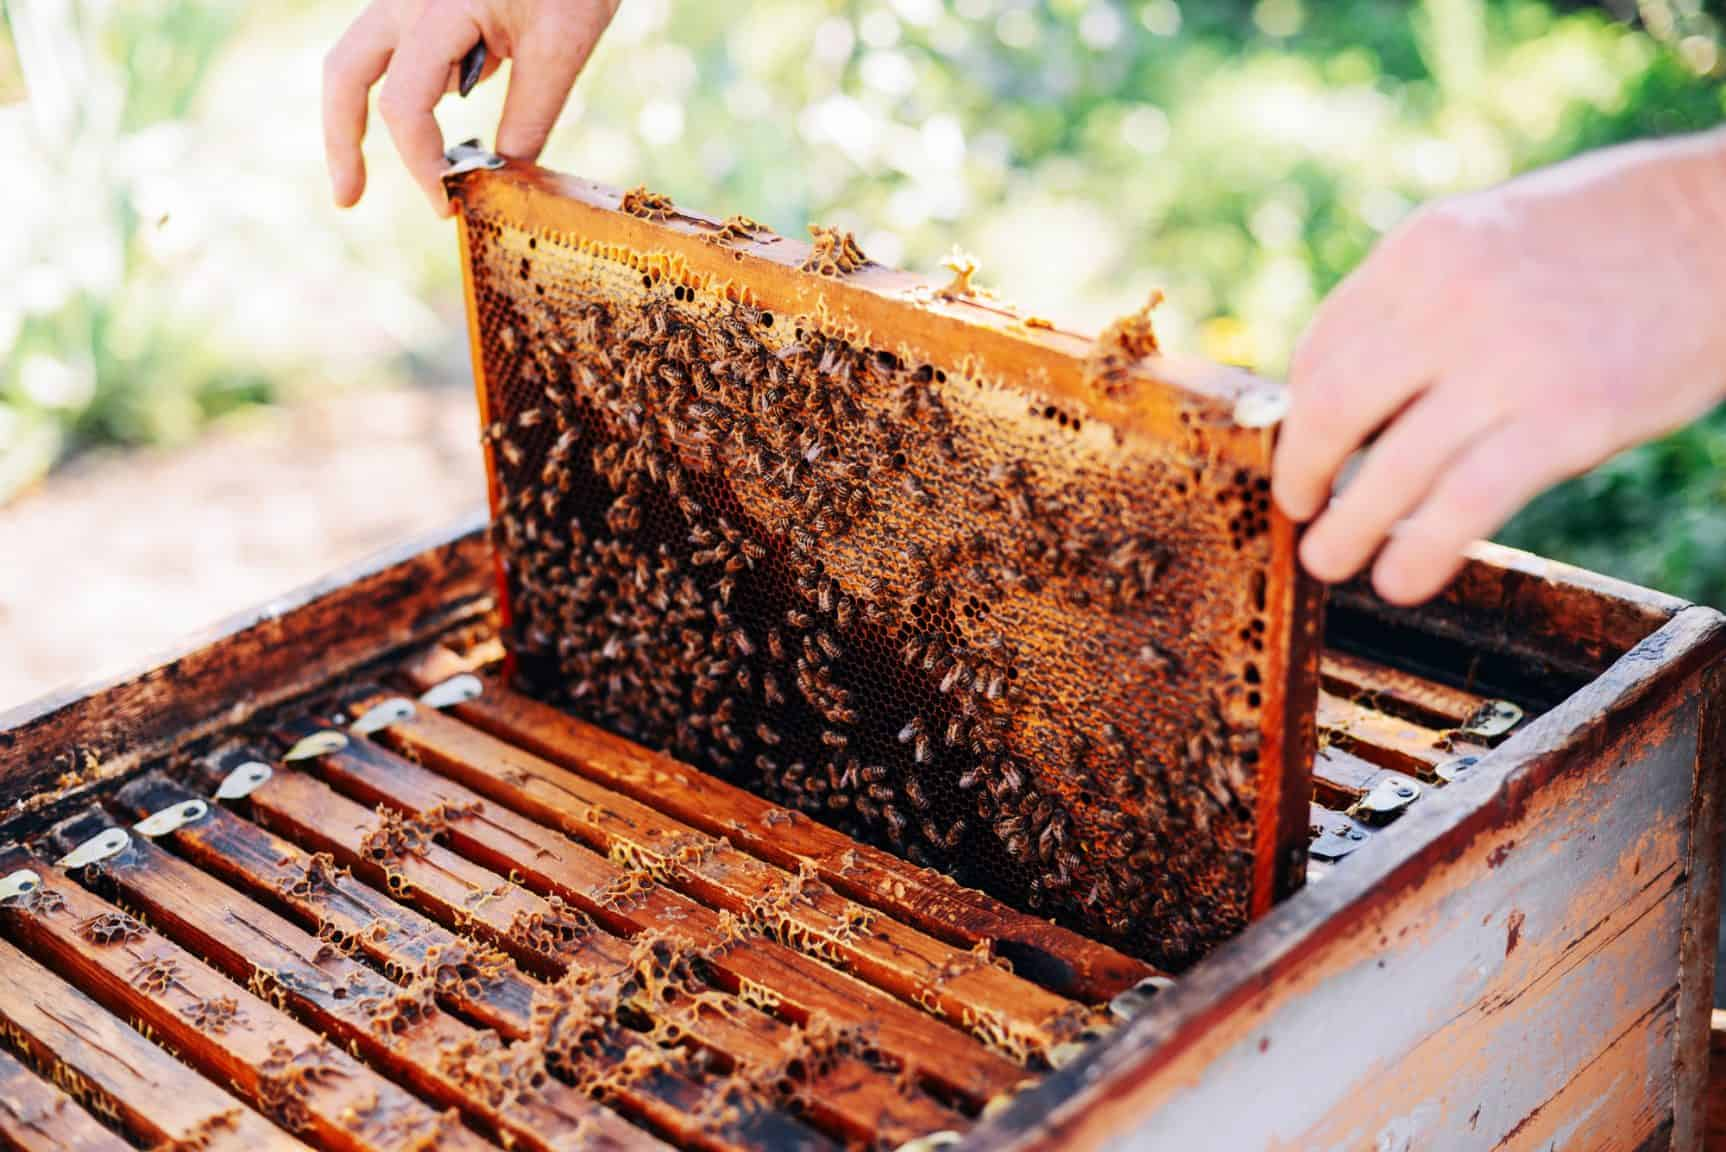 Considering the Joys of Beekeeping